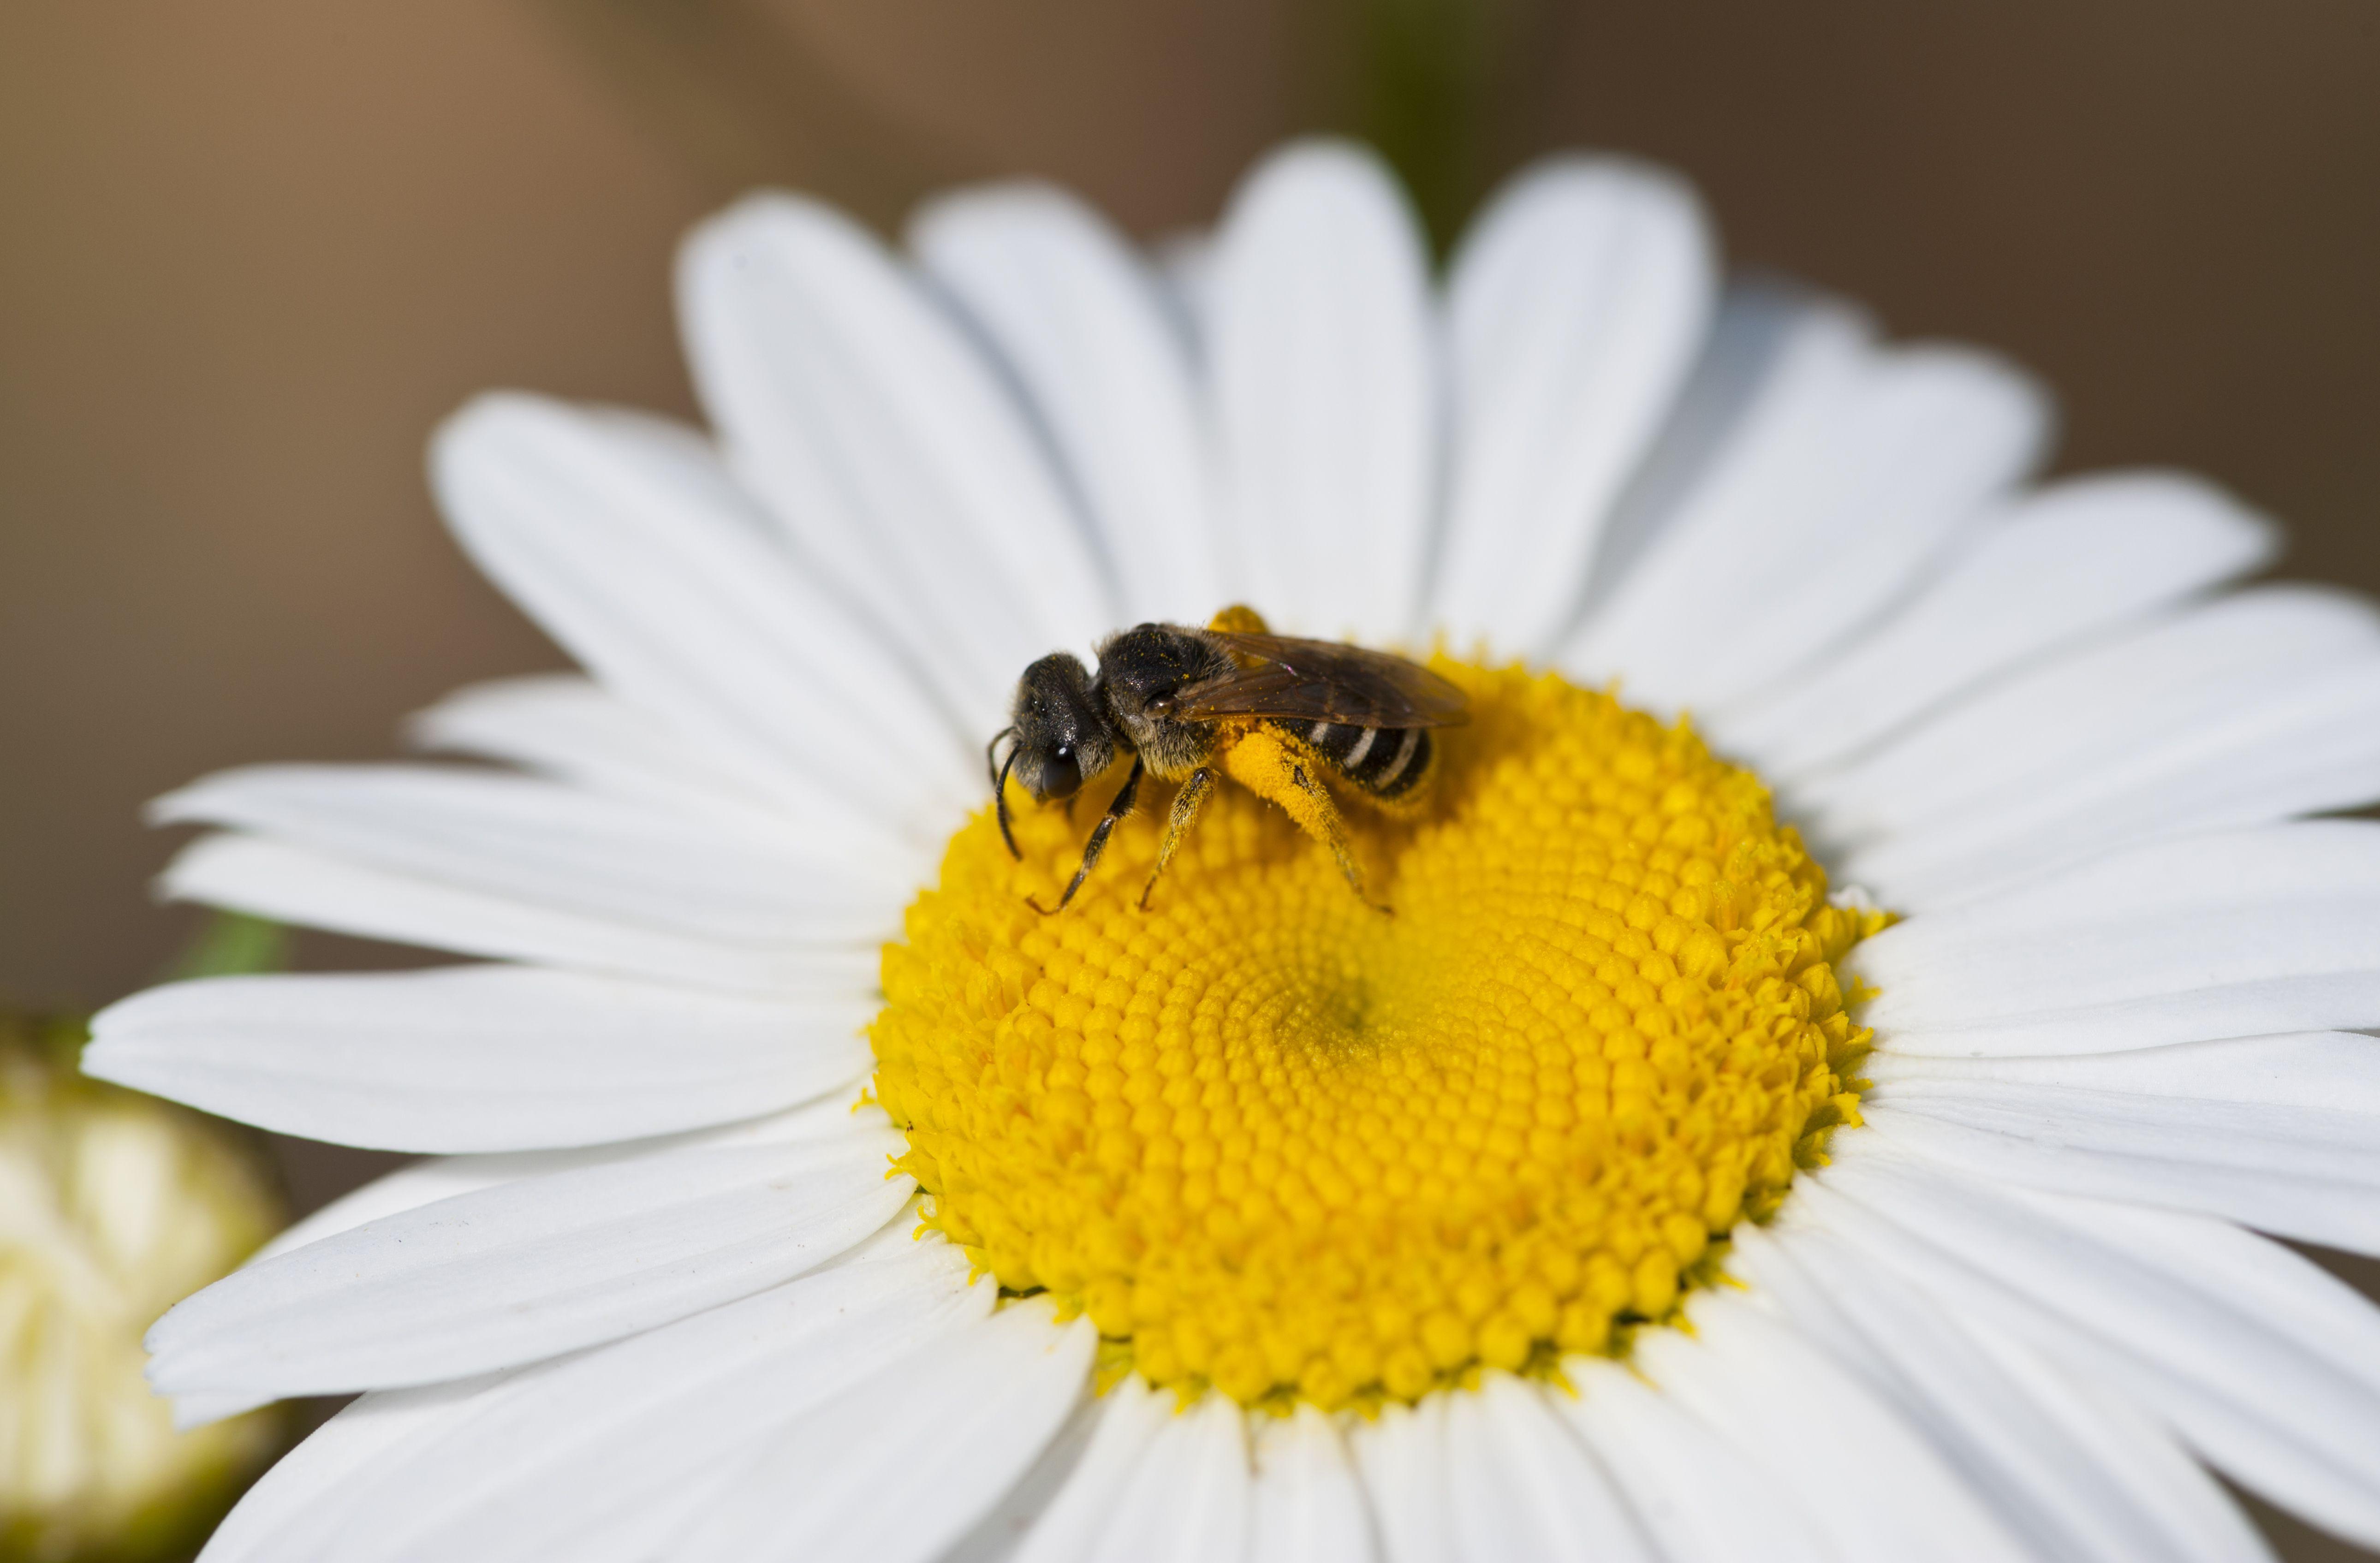 Sweat Bee (Halictus sp) collecting pollen on daisy